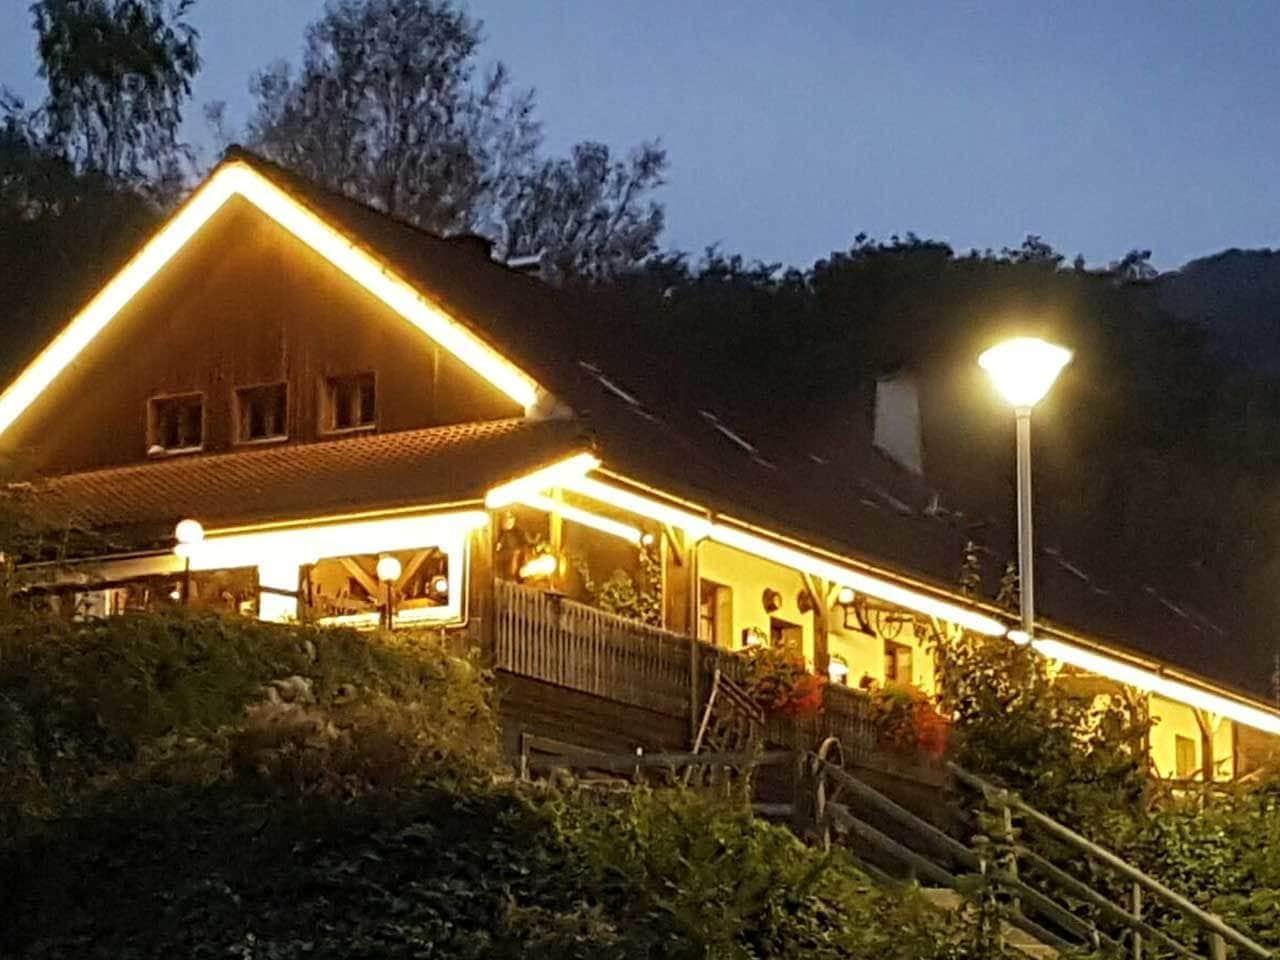 Ausflug: Röschti-Farm Bözenegg